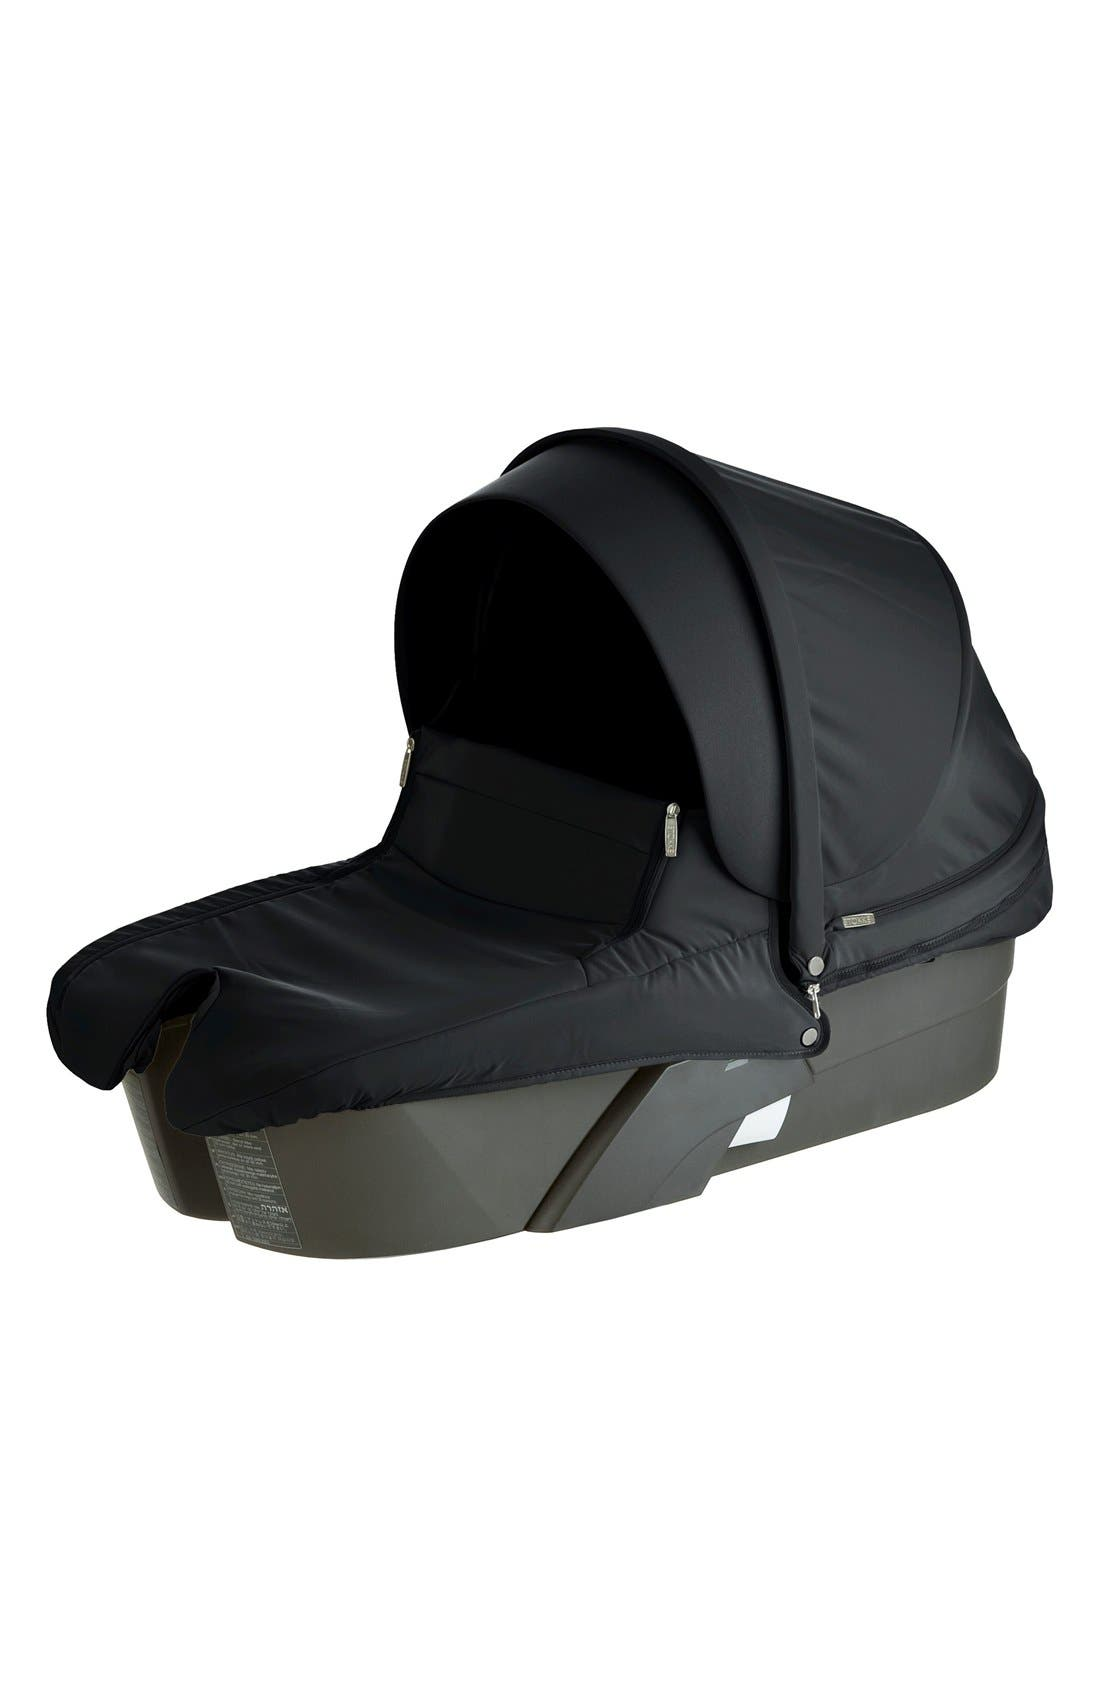 'Xplory<sup>®</sup>' Stroller Carry Cot,                             Main thumbnail 1, color,                             001